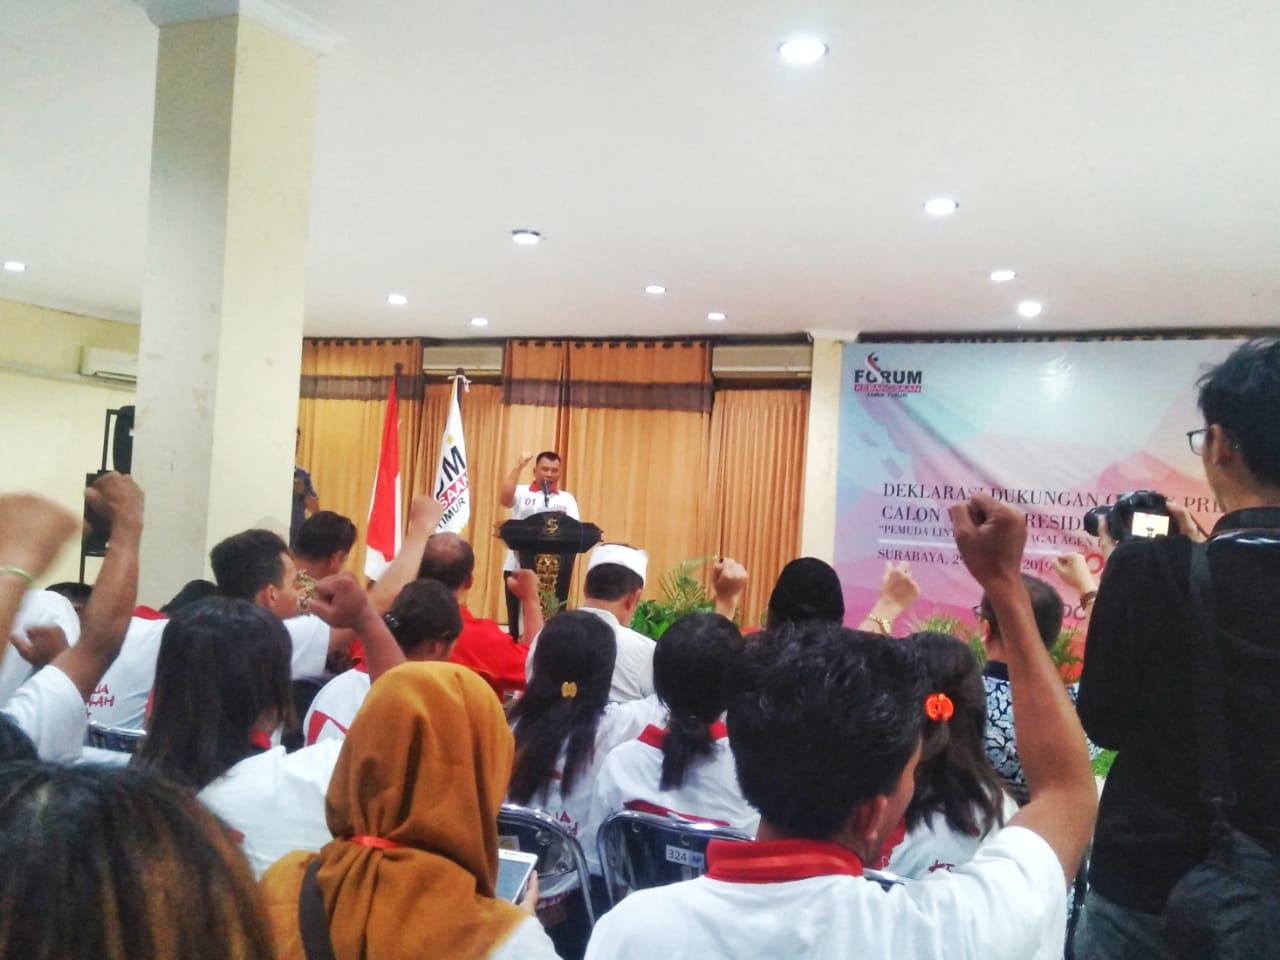 FKJ Deklarasikan Dukungan untuk Jokowi-Amin